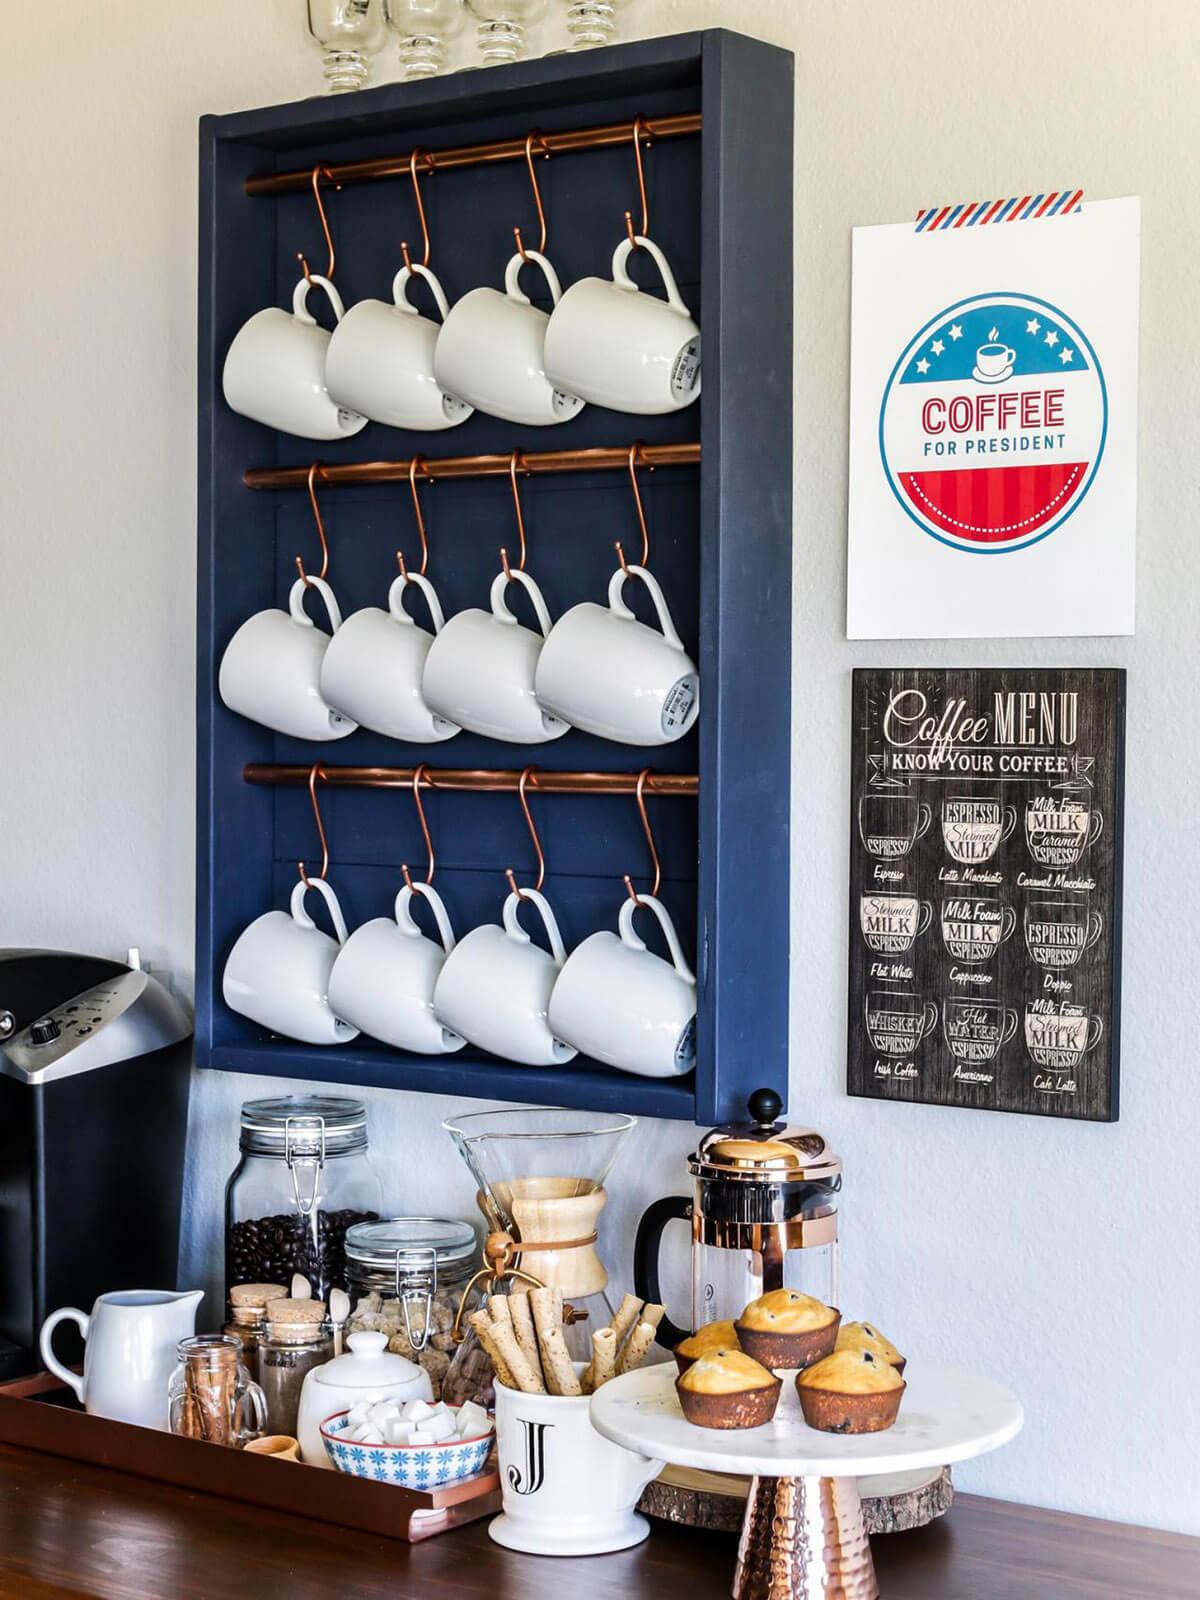 Coffee Mug Holder with Graceful S Hooks